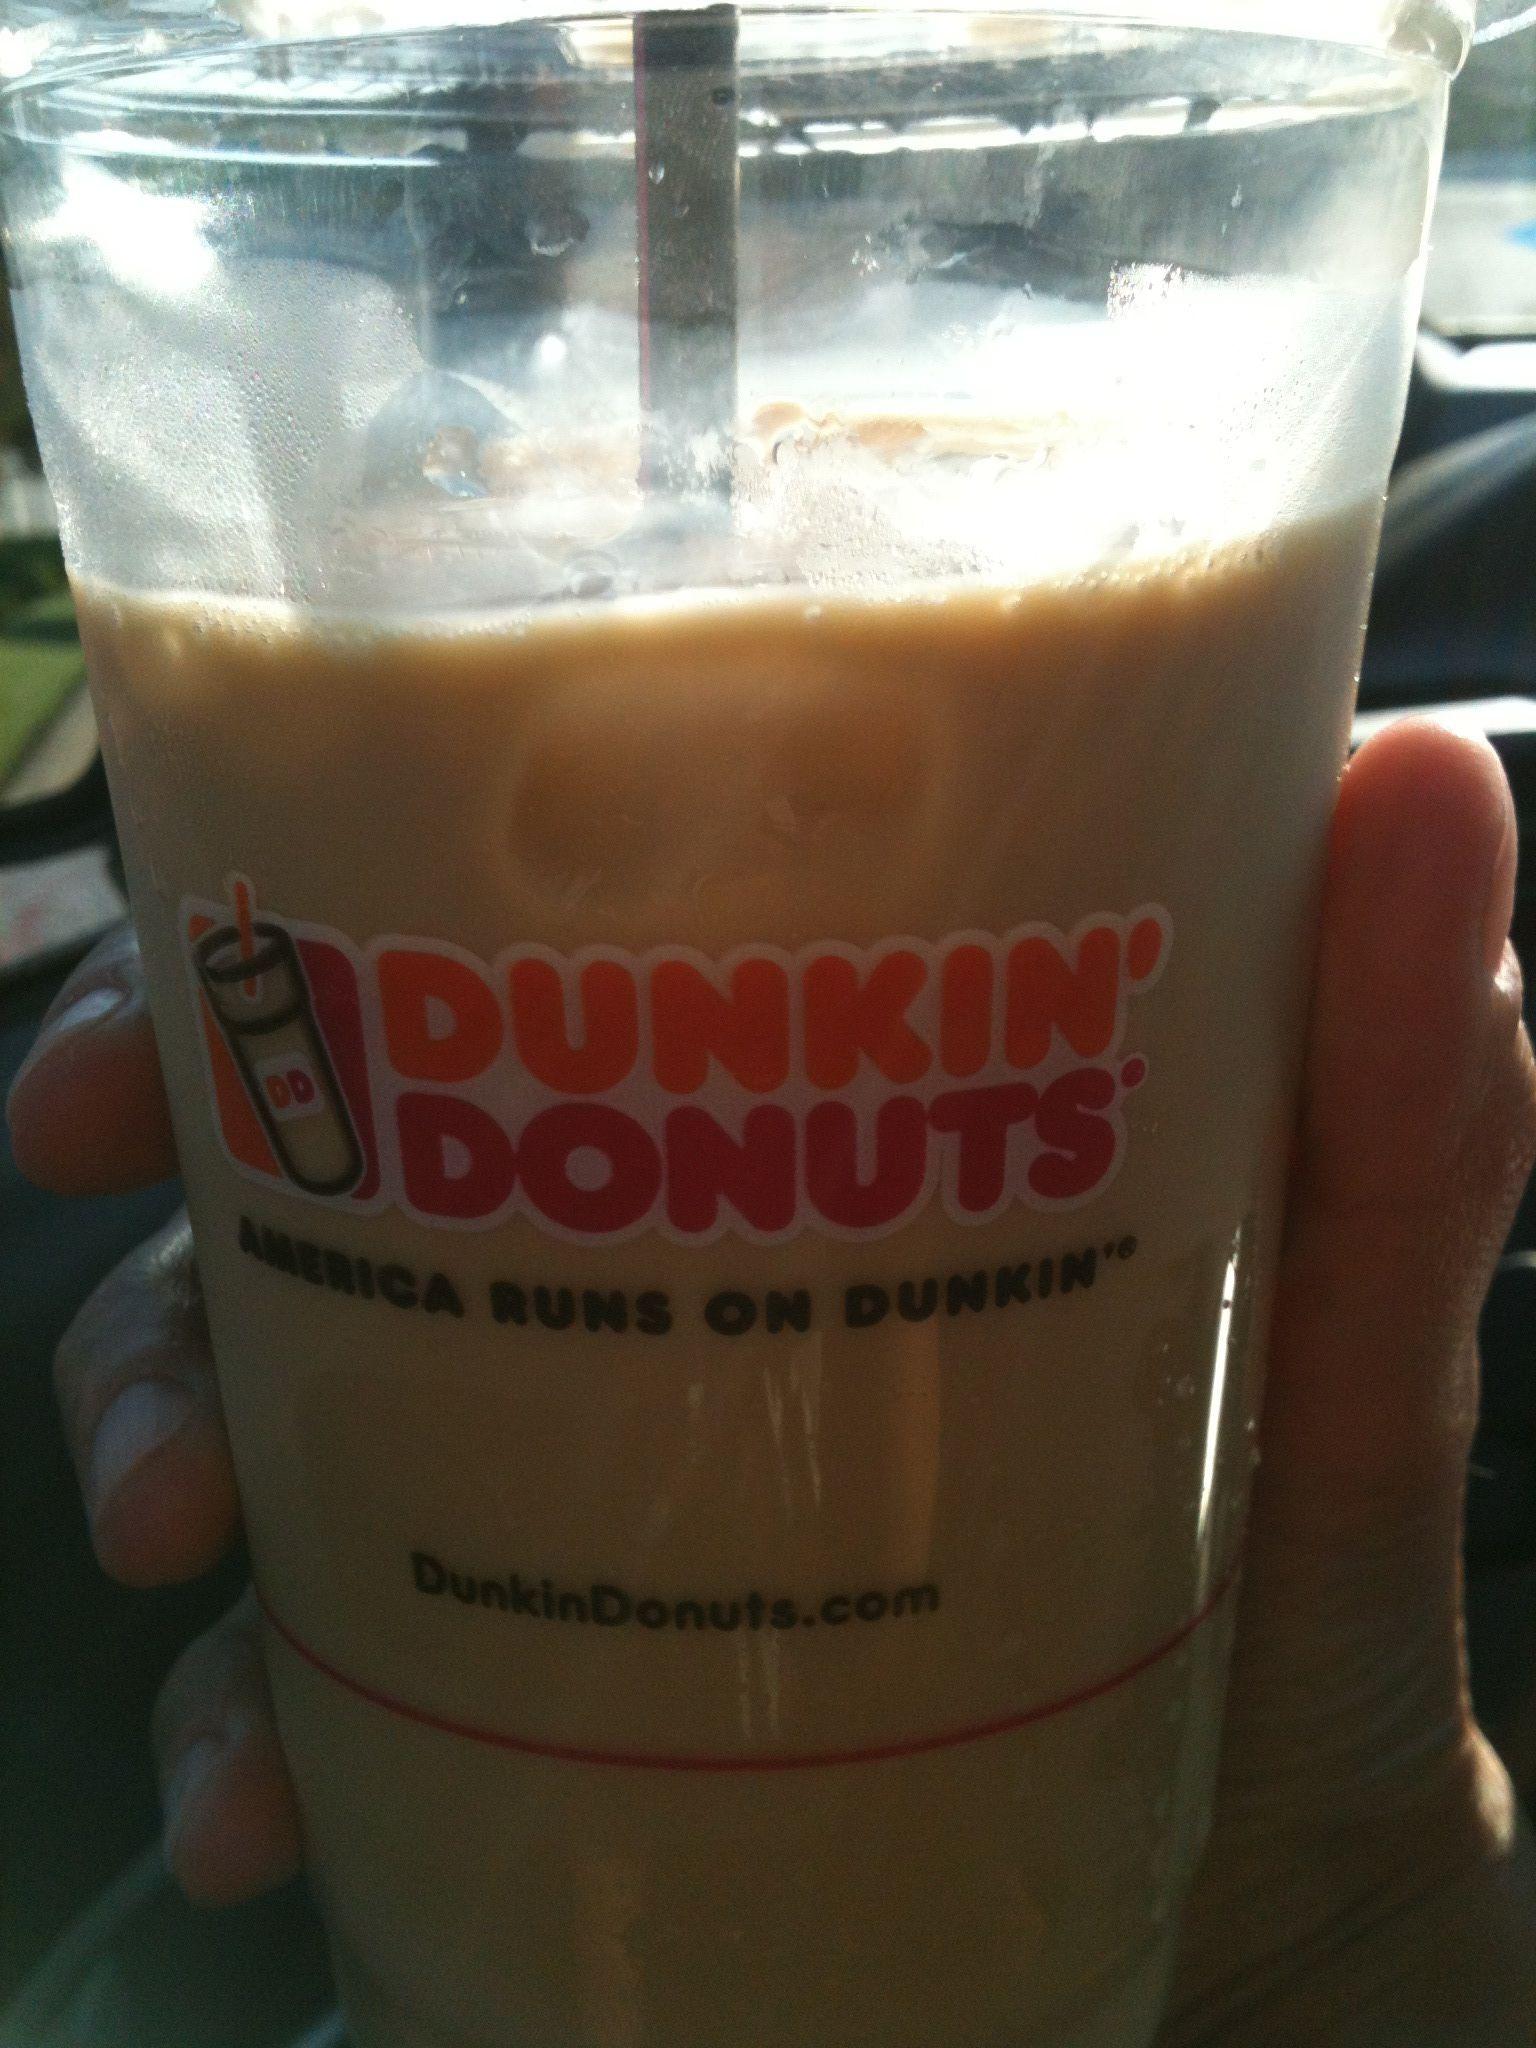 Dunkin donuts iced coffee dunkin donuts iced coffee